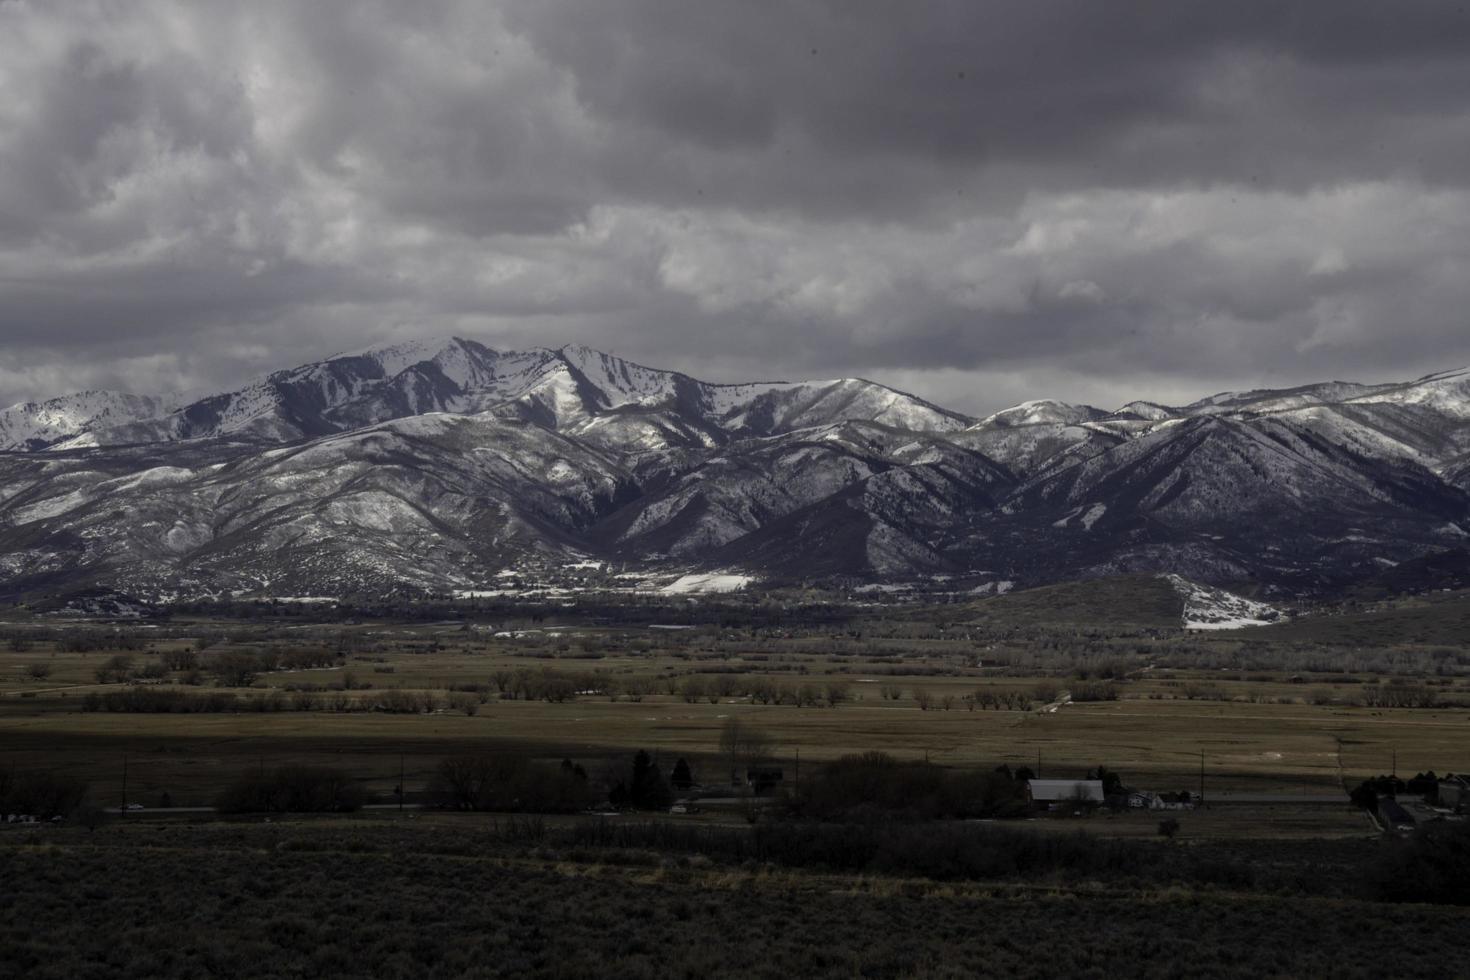 Heber Valley, Utah photo